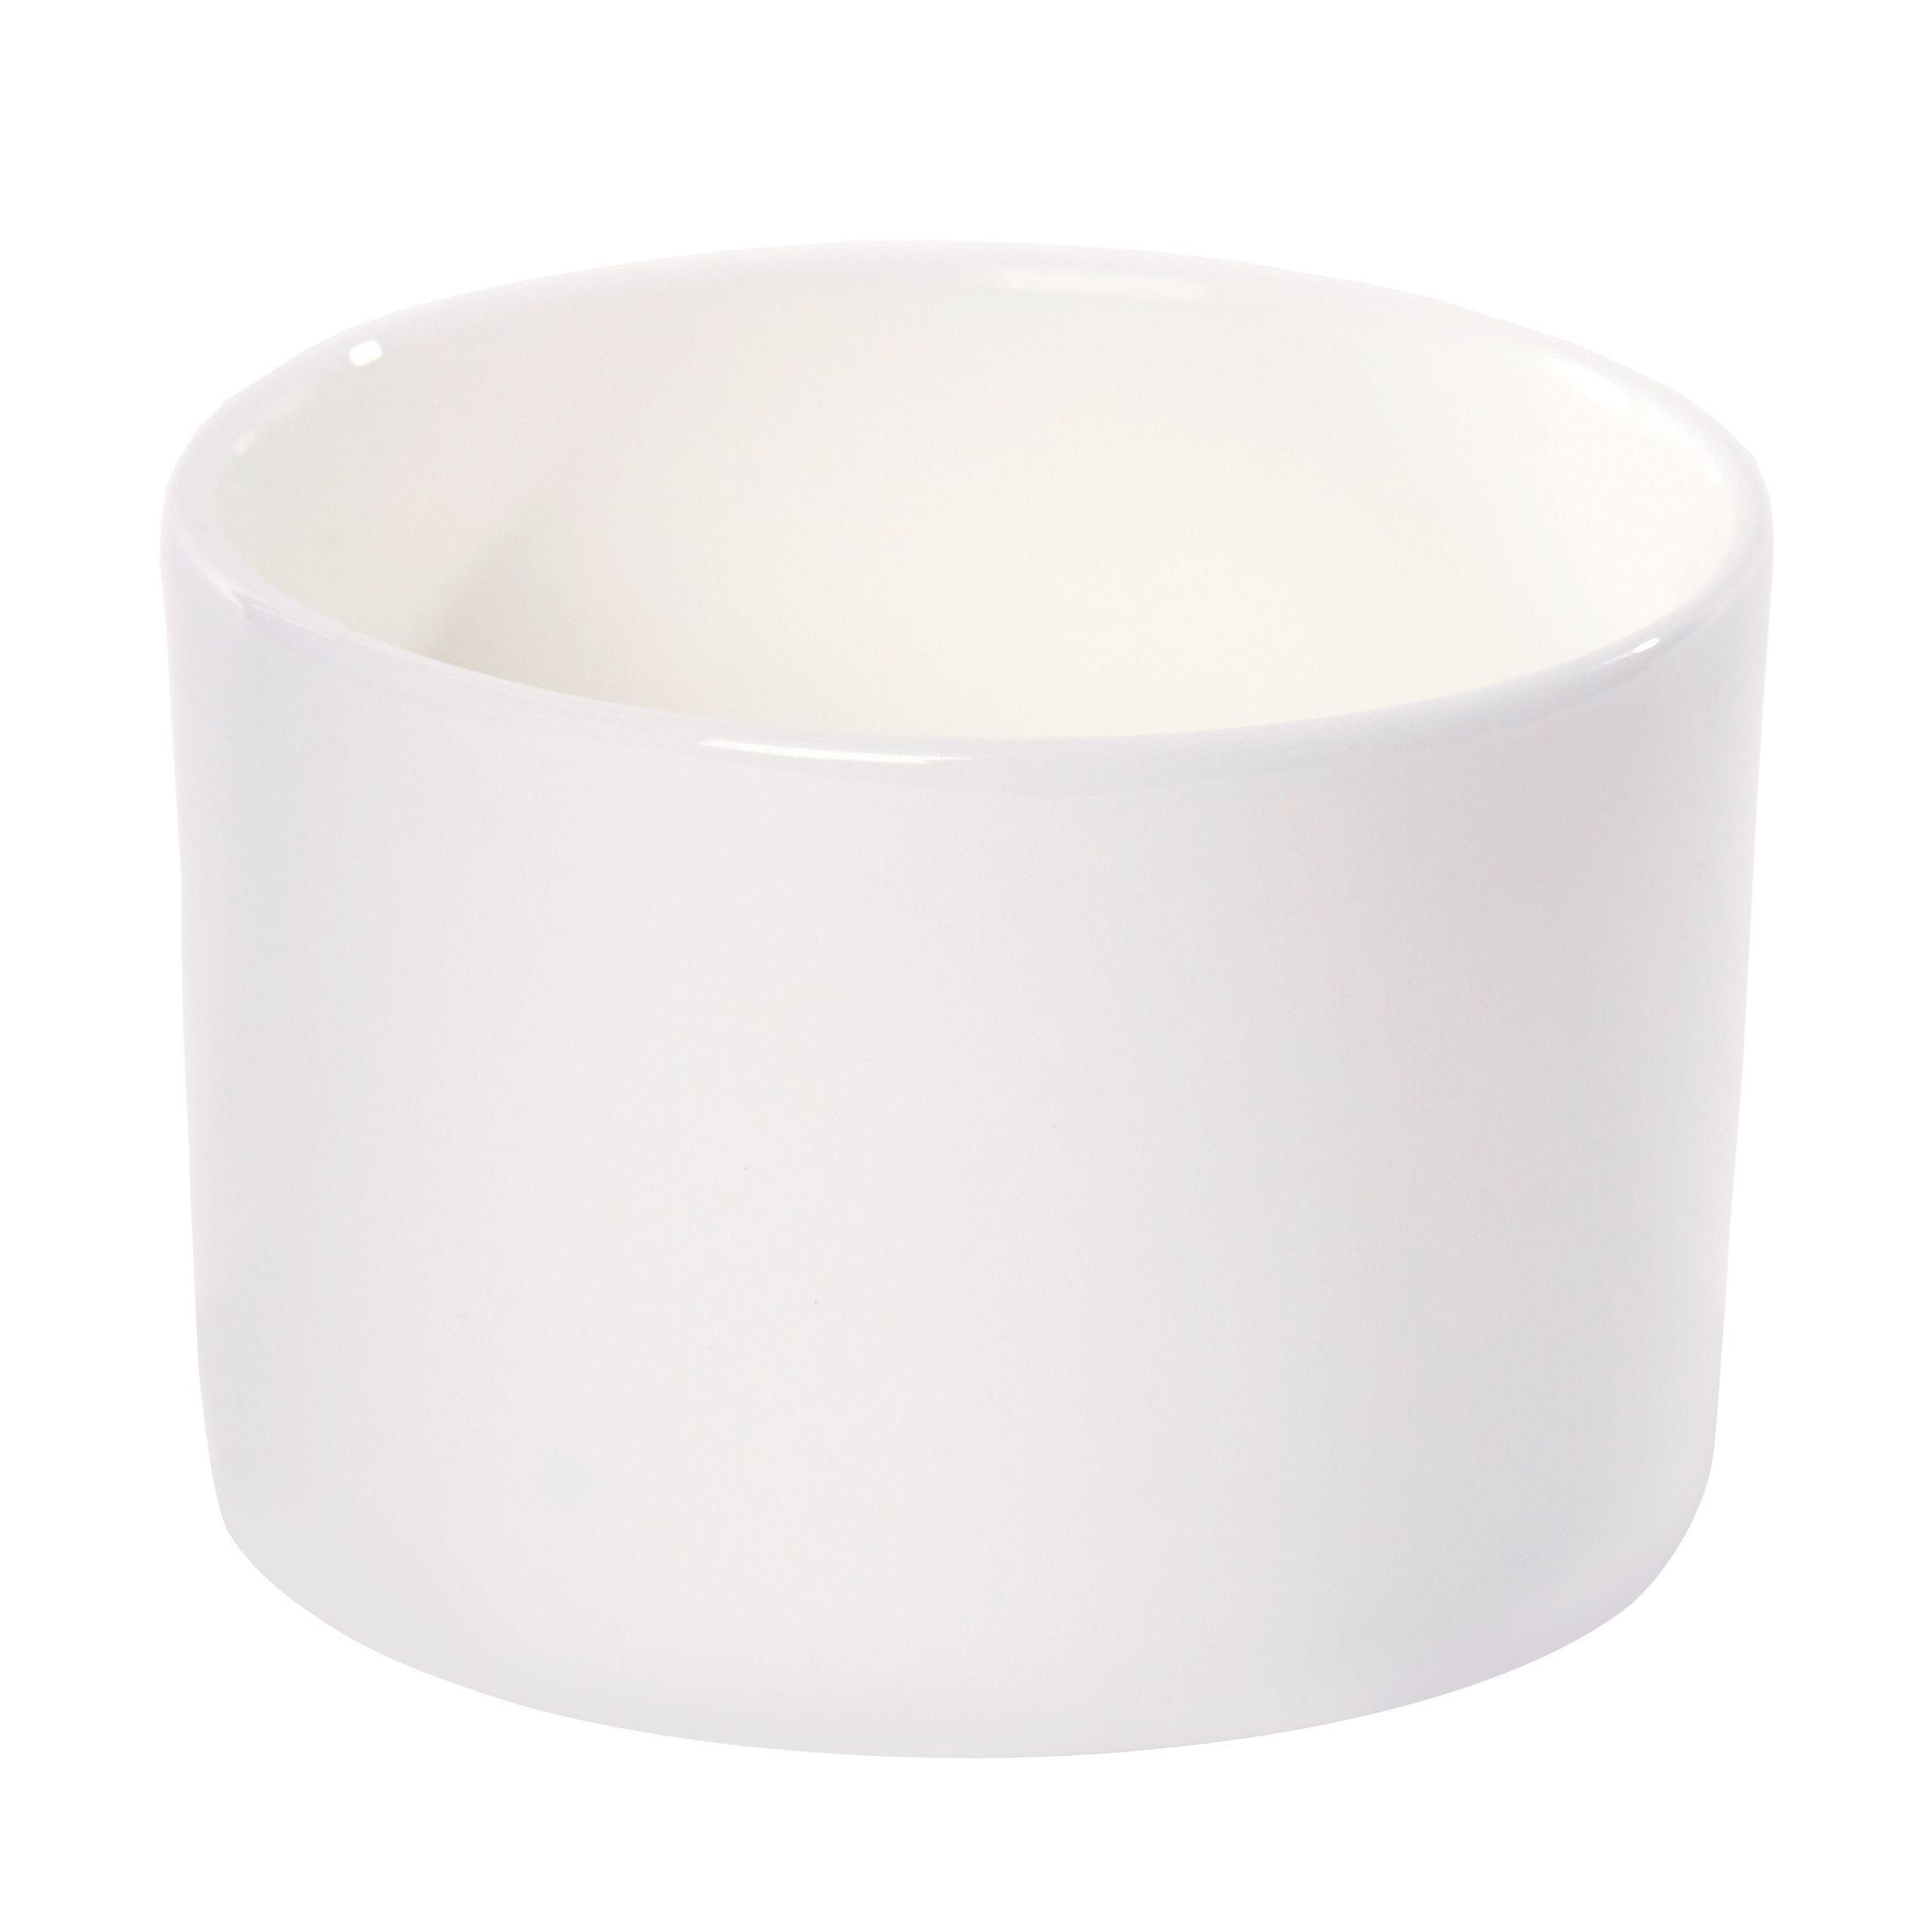 Tableware - Tea & Coffee Accessories - Espresso Juice Mug by Thelermont Hupton - White - China